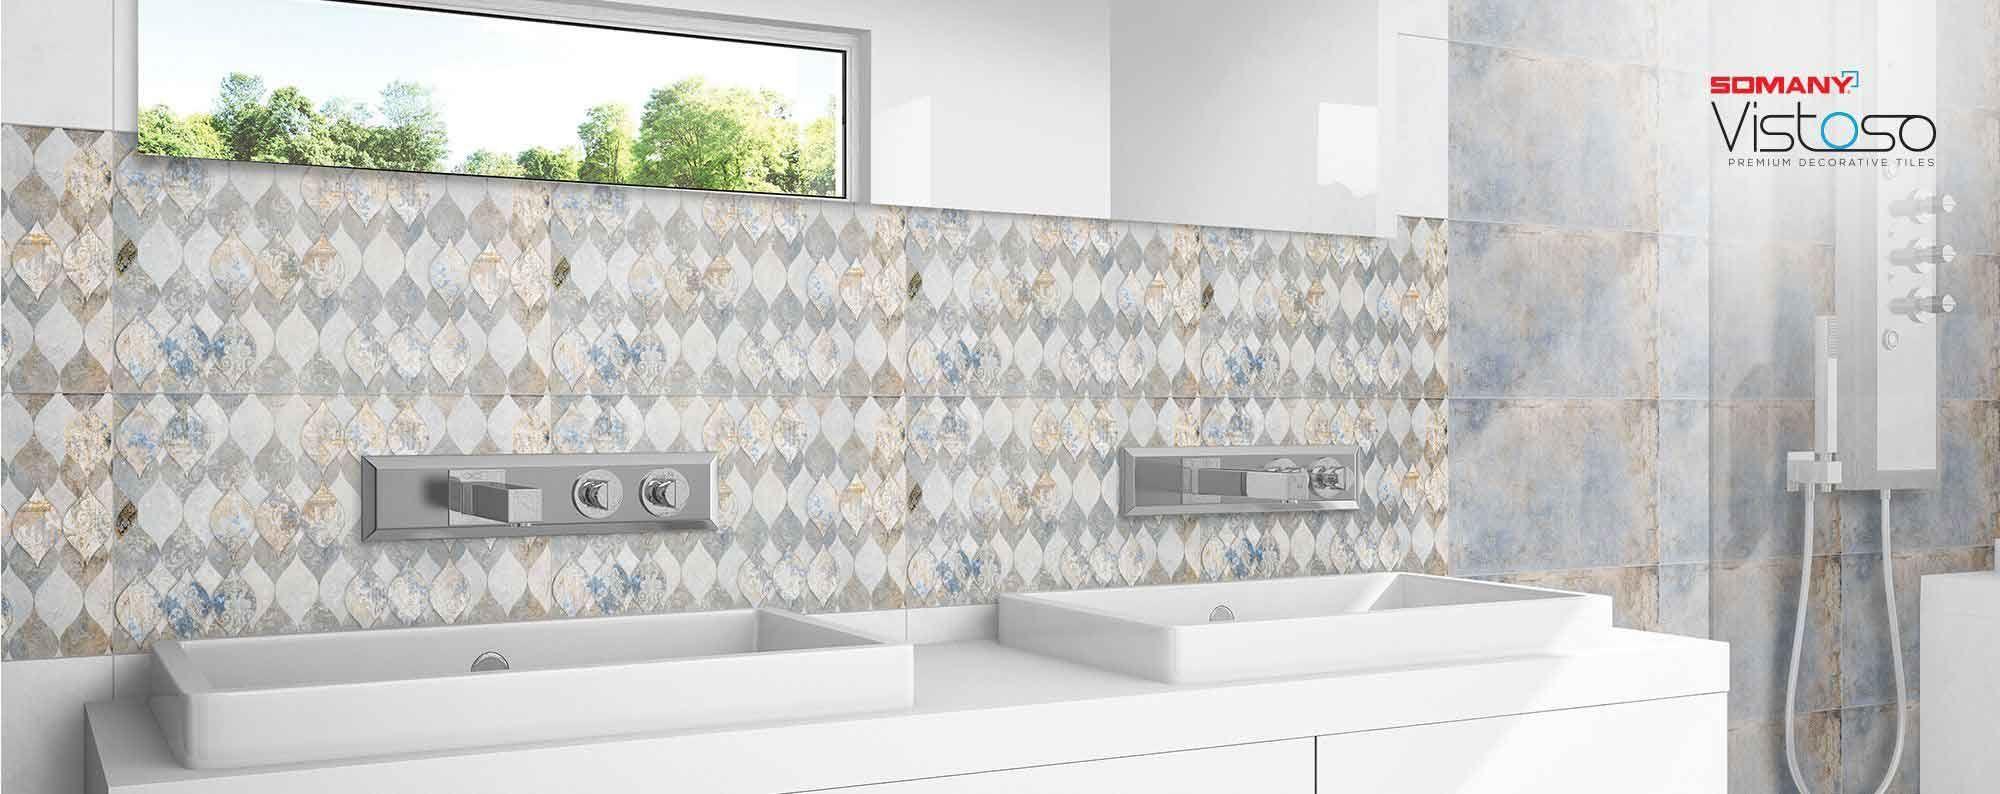 34 Luxury Ceramic Tiles Bathroom Ceramic Tiles Bathroom Largest Collection Of Ceramic Wall Tile White Tile Bathroom Walls Bathroom Wall Tile Wall Tiles Design